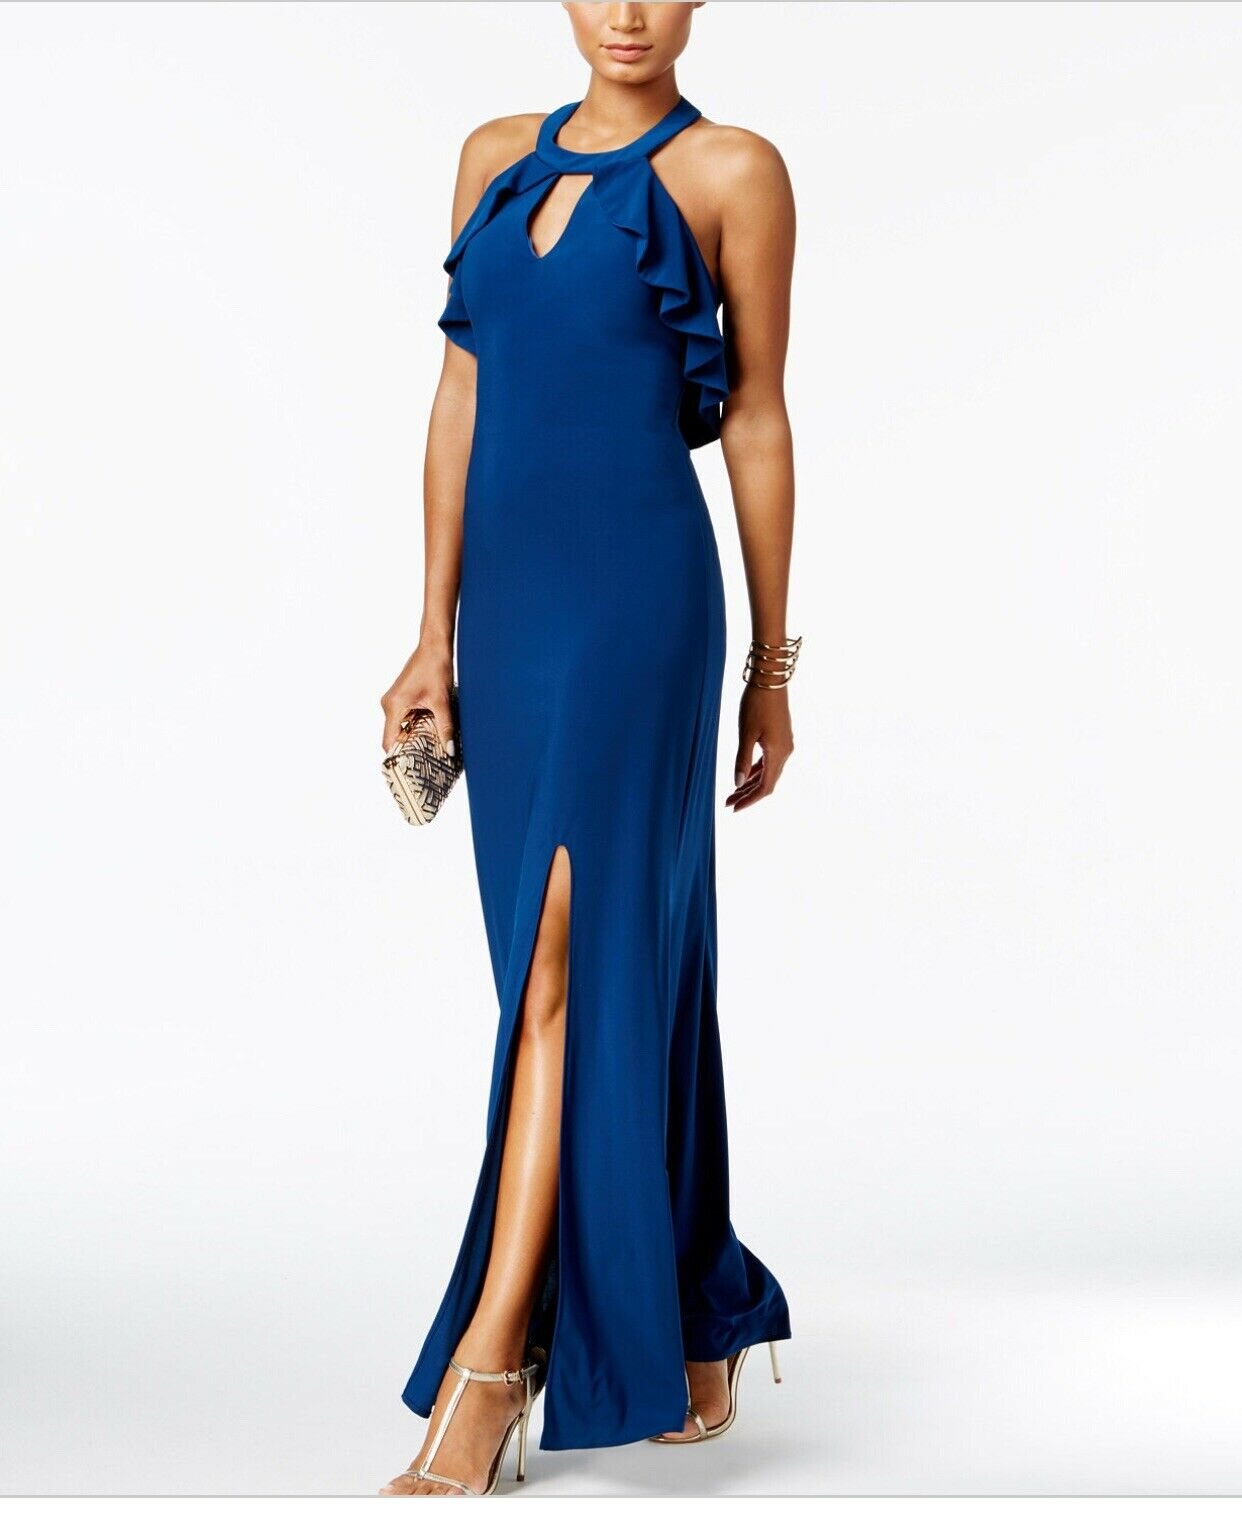 Nightway Ruffled Halter Gown, Size 10